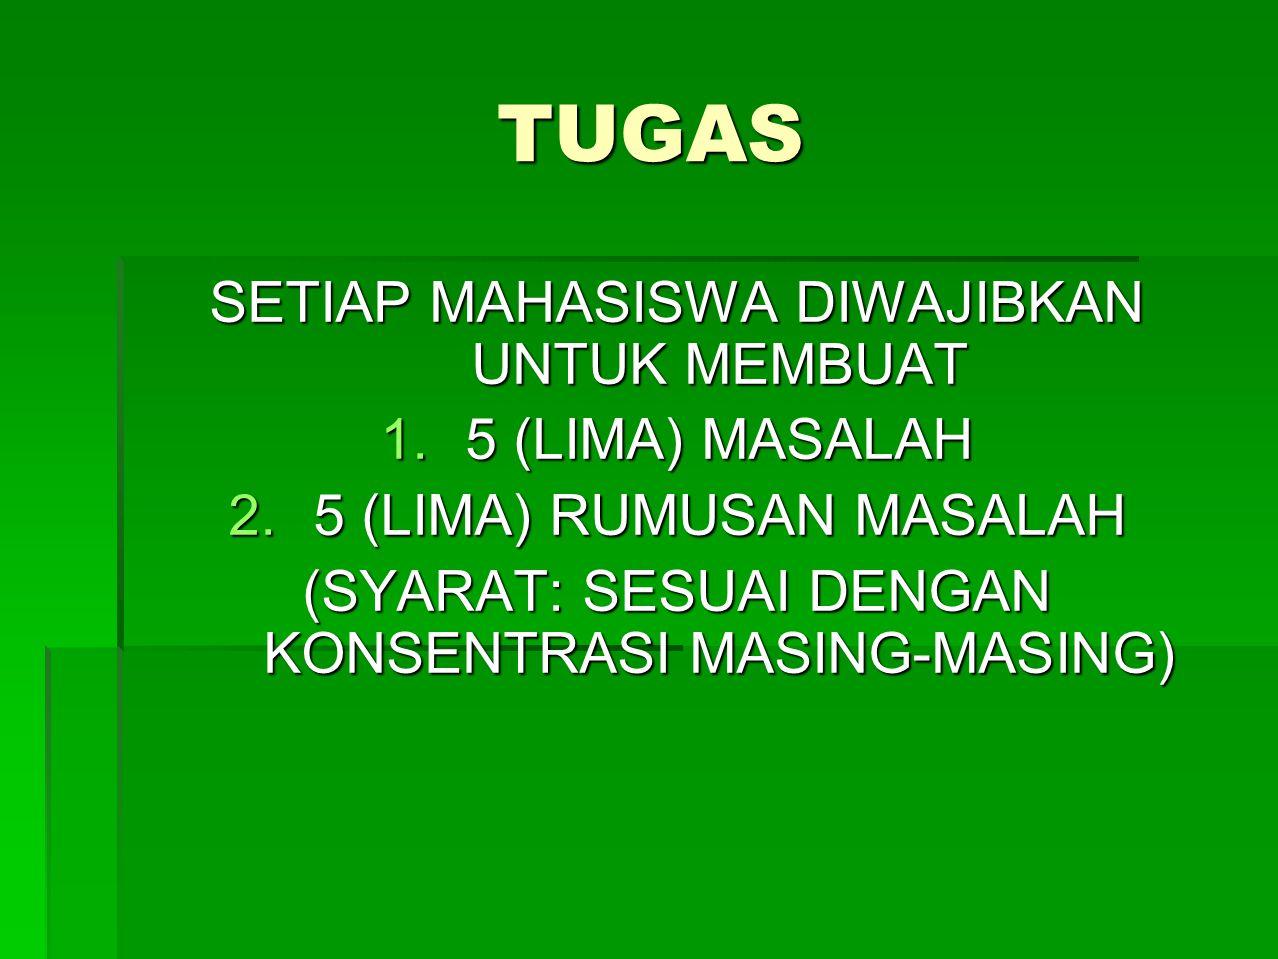 TUGAS SETIAP MAHASISWA DIWAJIBKAN UNTUK MEMBUAT 5 (LIMA) MASALAH